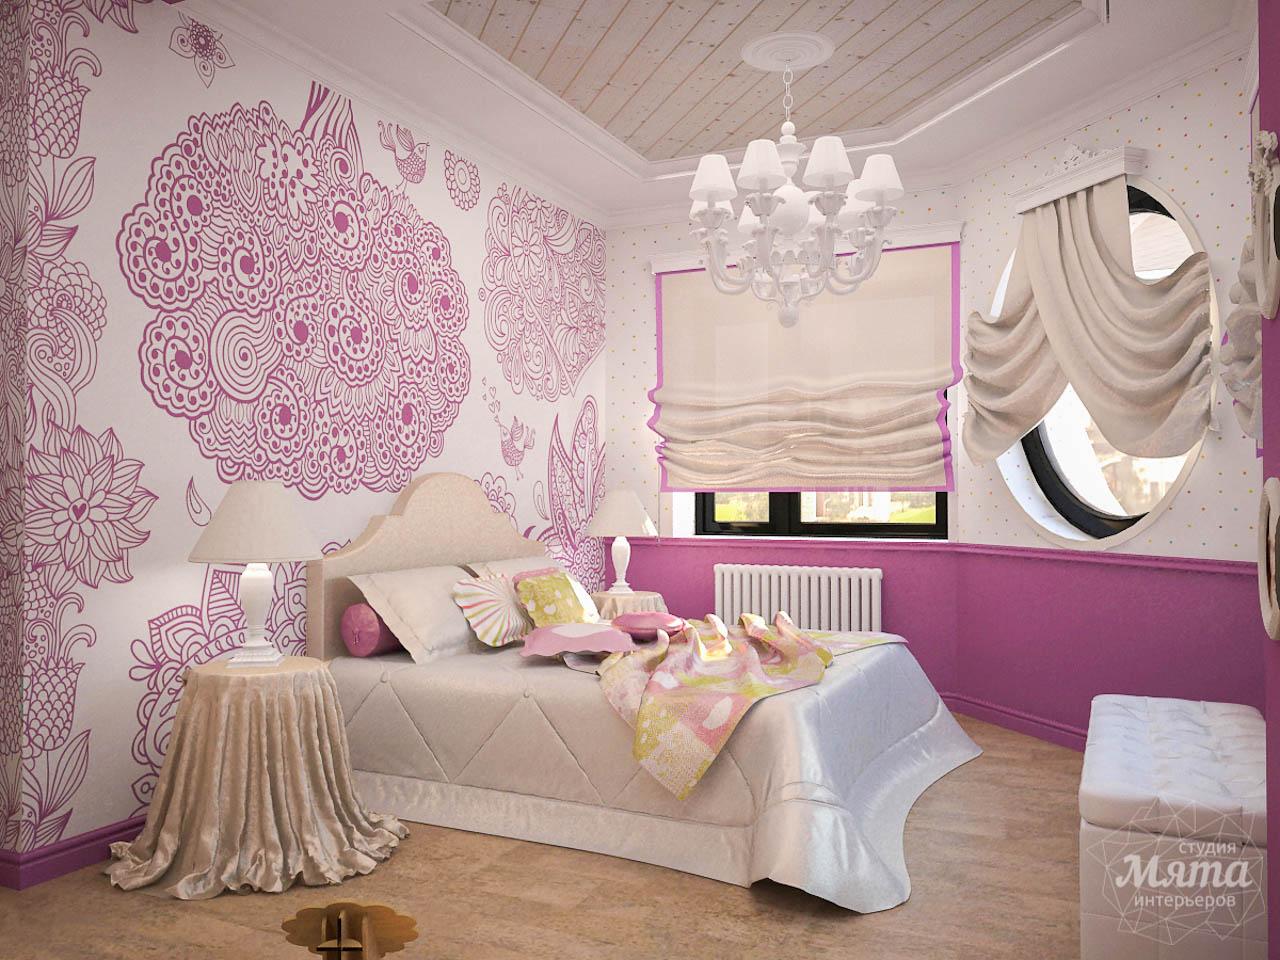 Дизайн интерьера коттеджа по ул. Ландышевая 23 img842599222